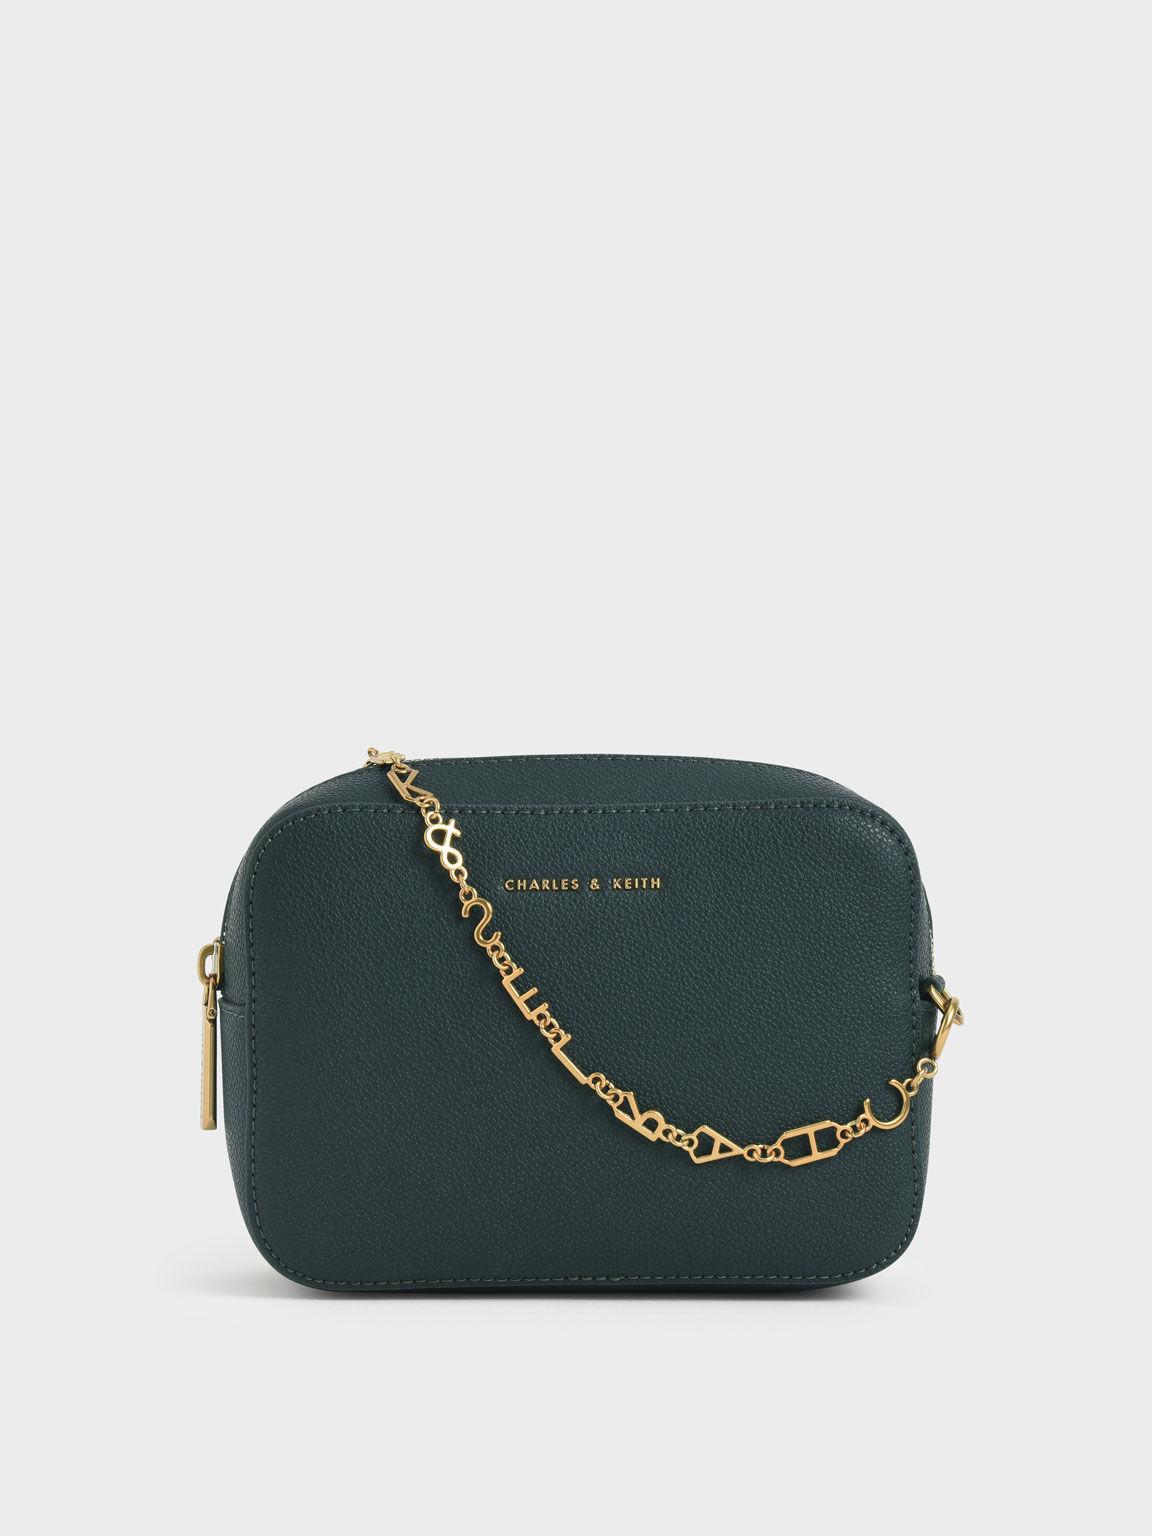 Chain Link Boxy Clutch, Dark Green, hi-res